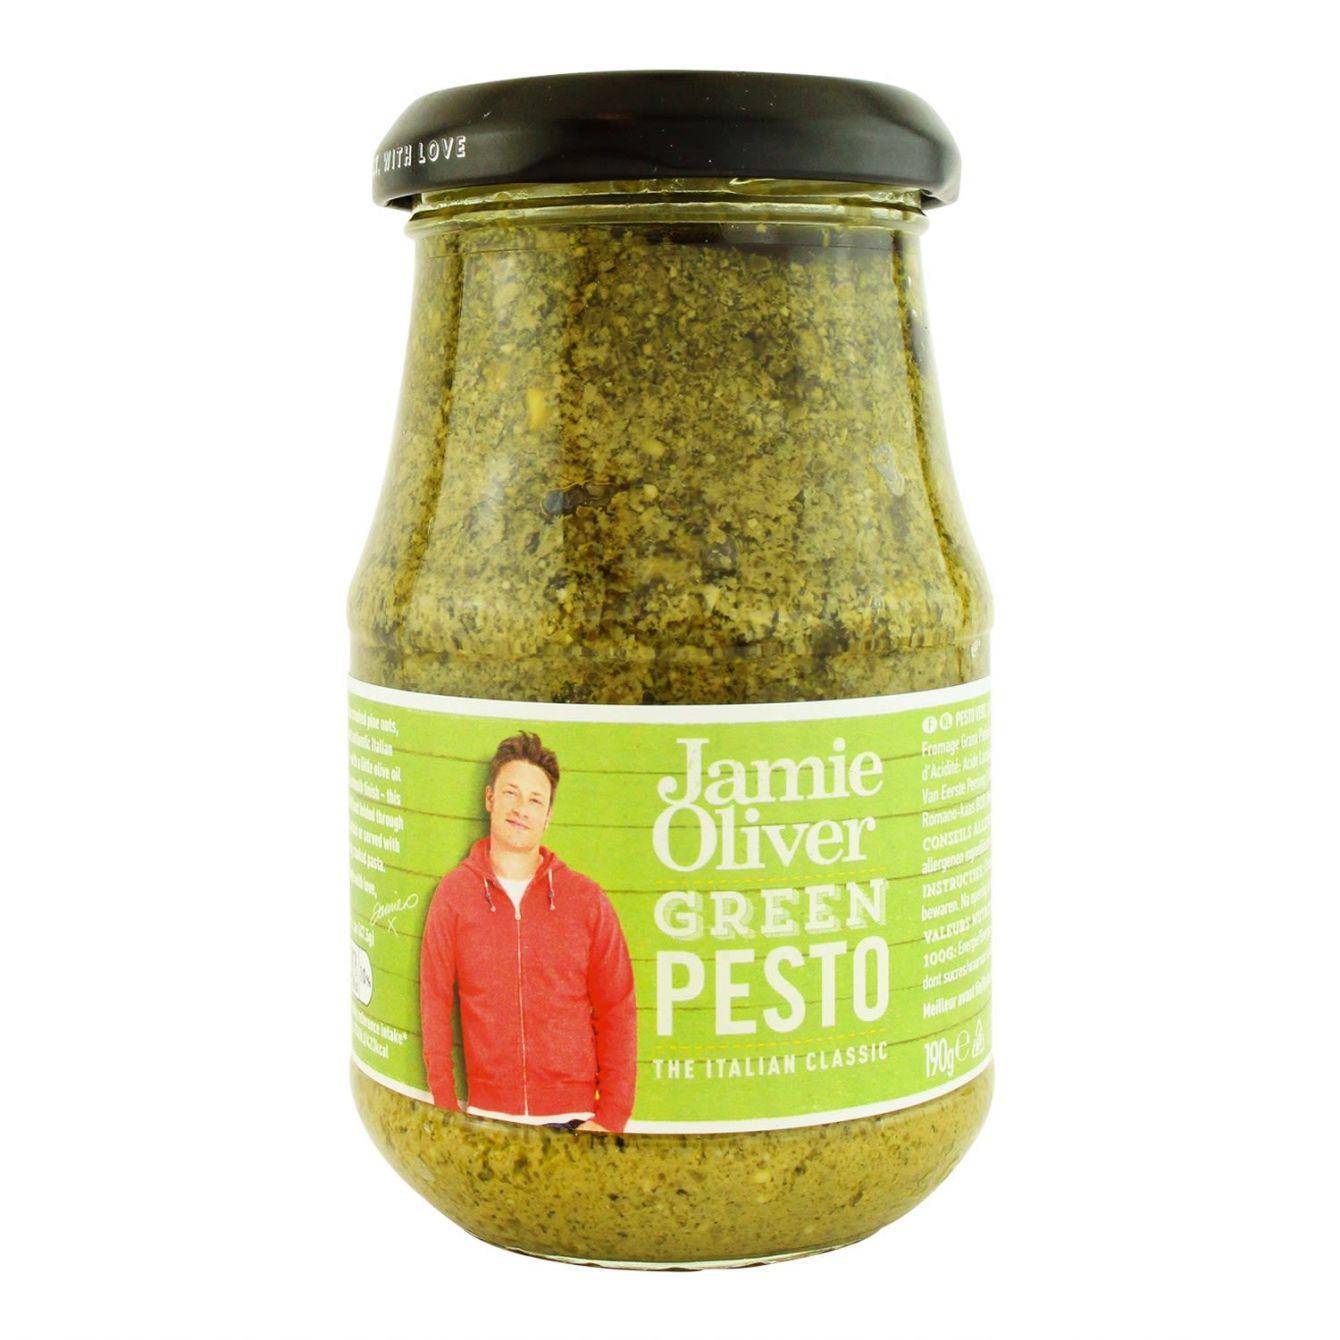 Jamie Oliver Groene Pesto